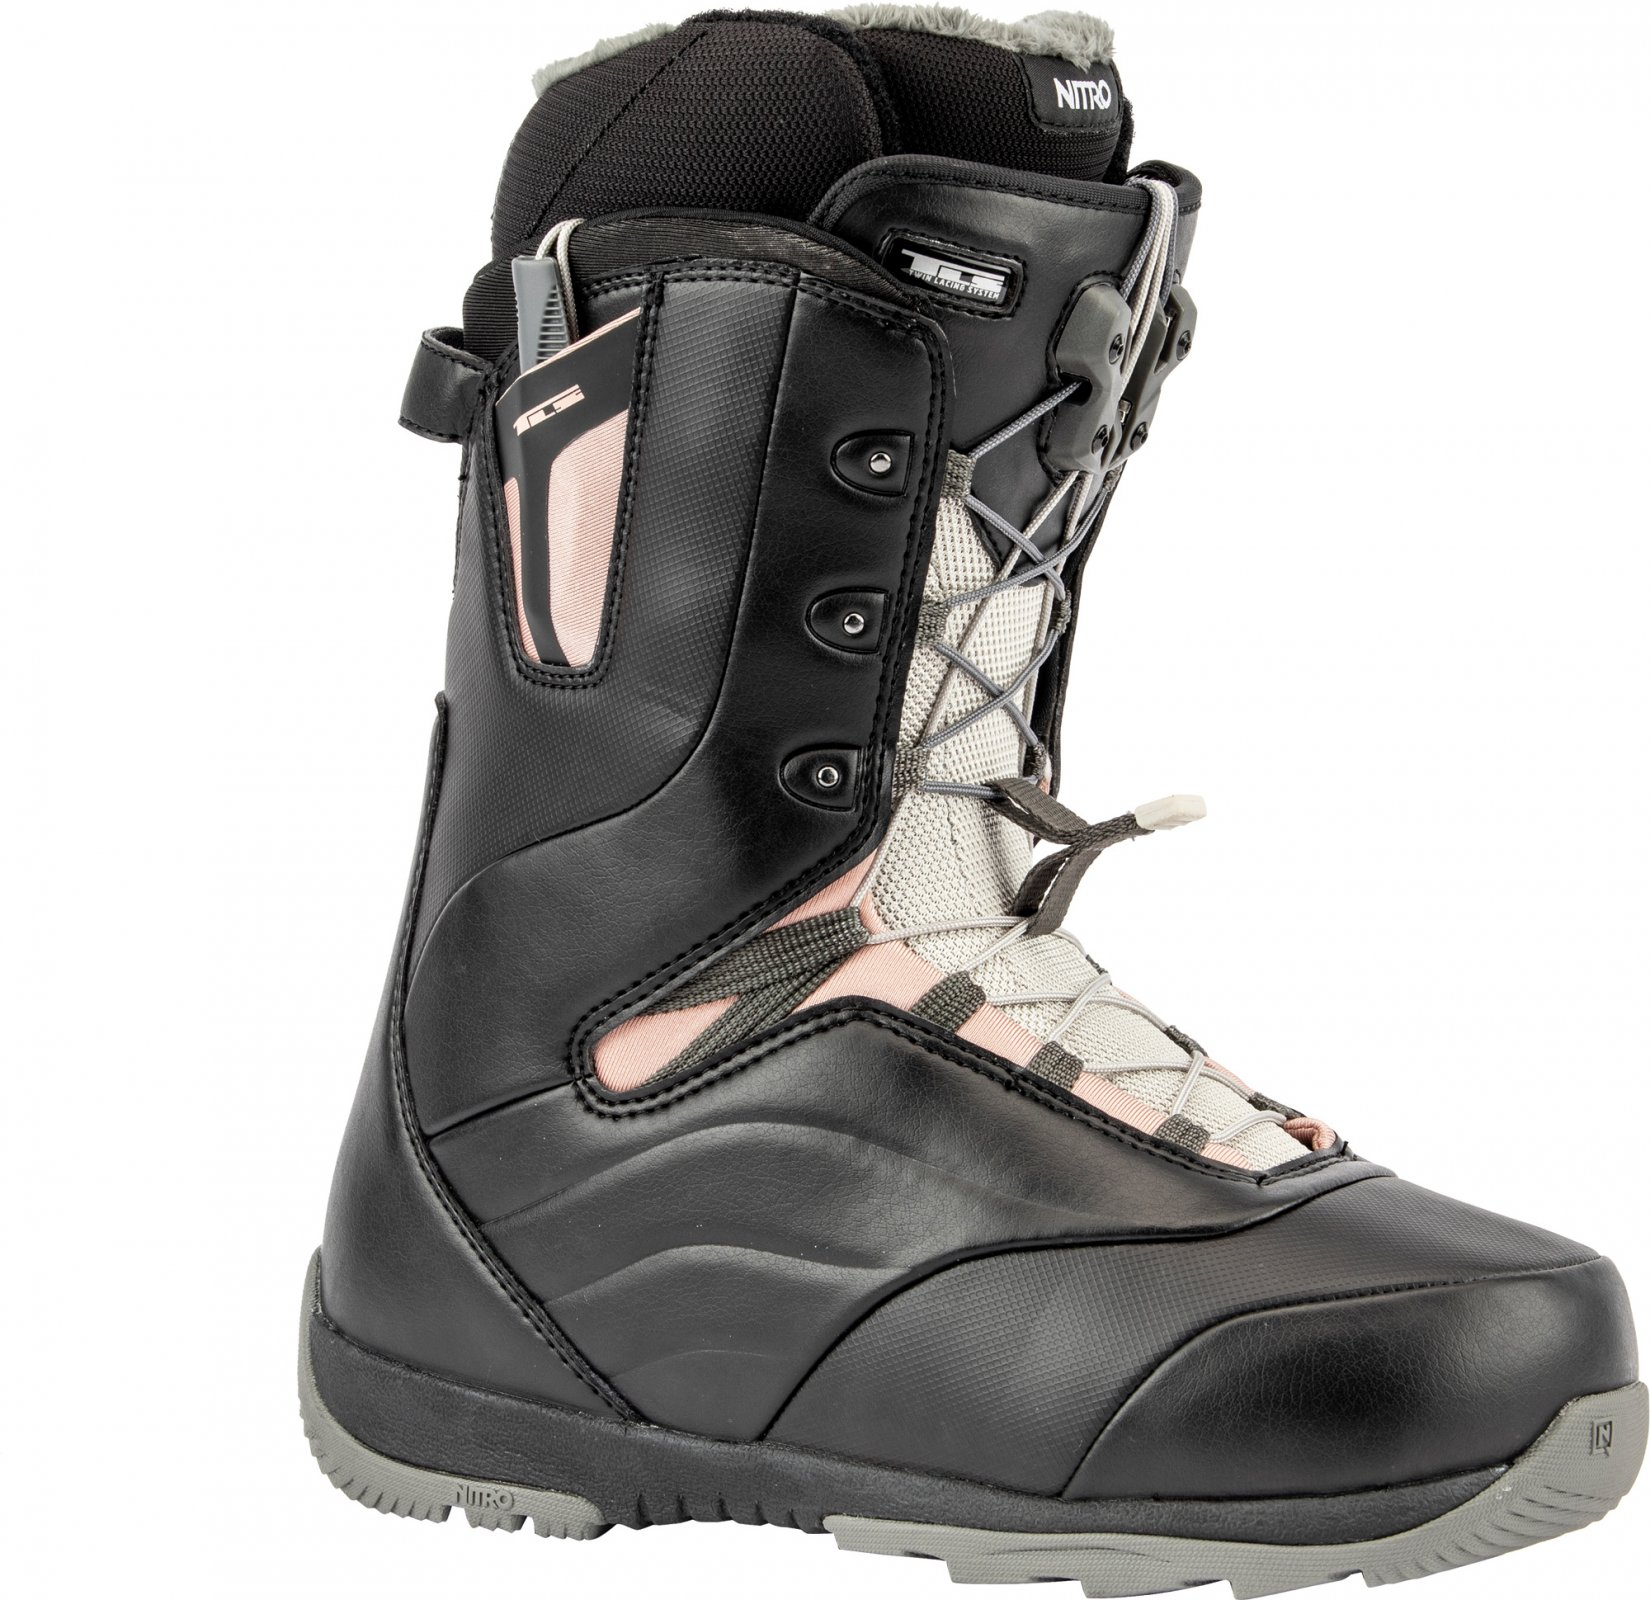 Nitro Crown TLS Snowboard Boots 2020